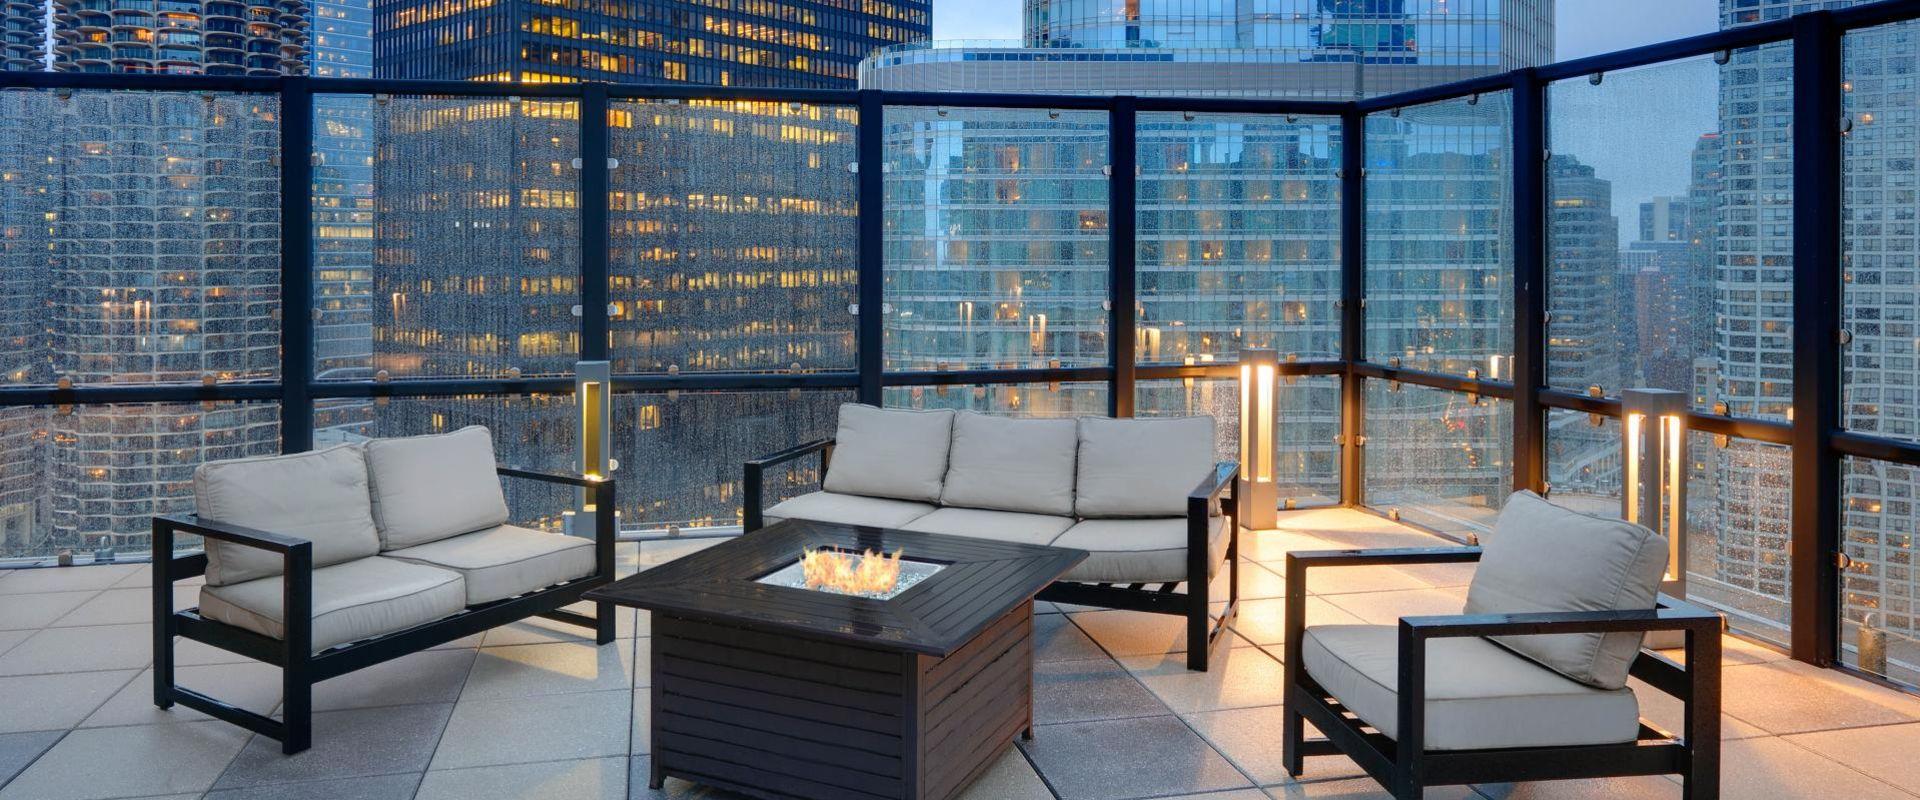 Chicago Terrace